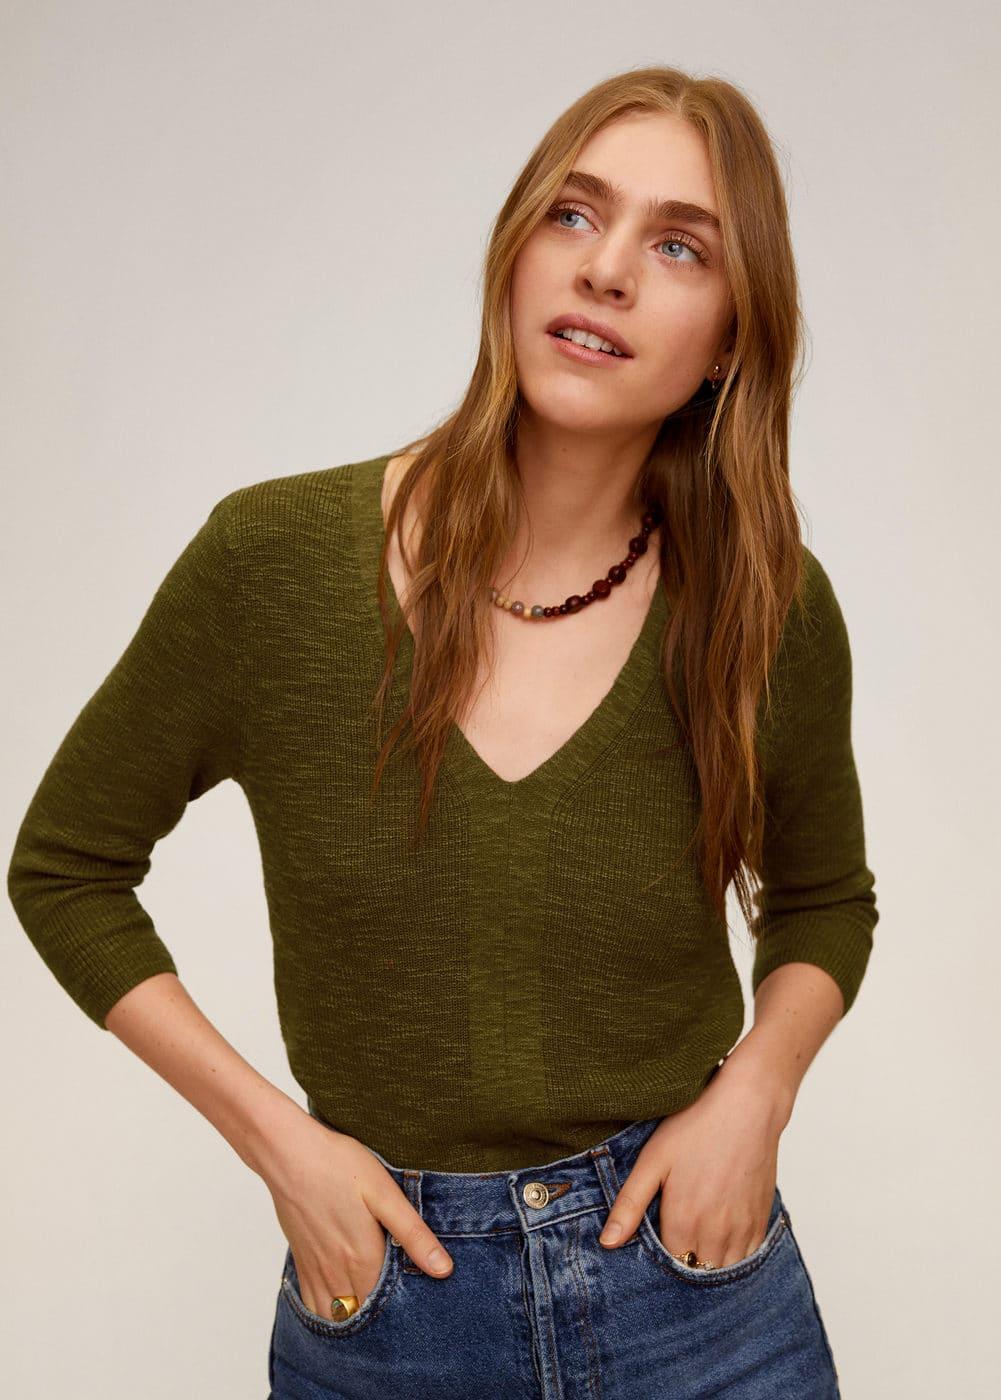 m-saeta:jersey escote pico